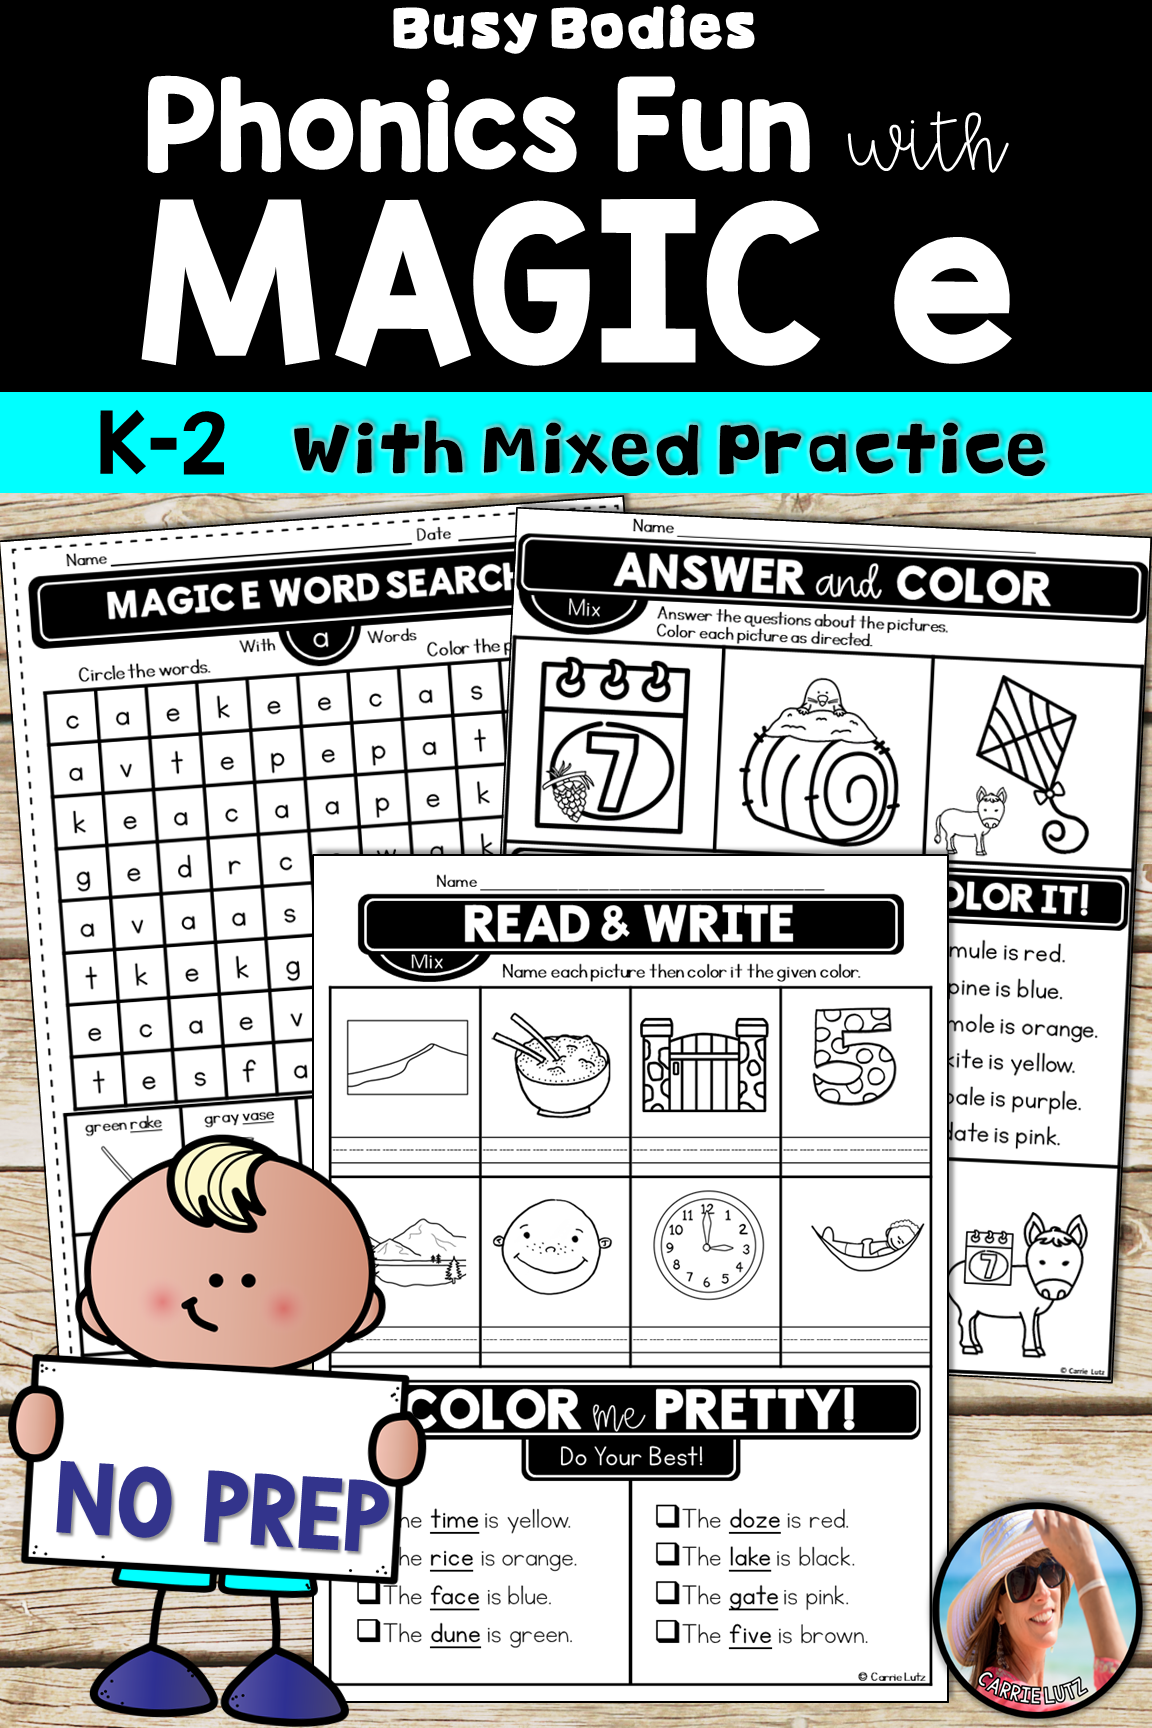 hight resolution of Phonics Magic E Worksheets K-2   Magic e